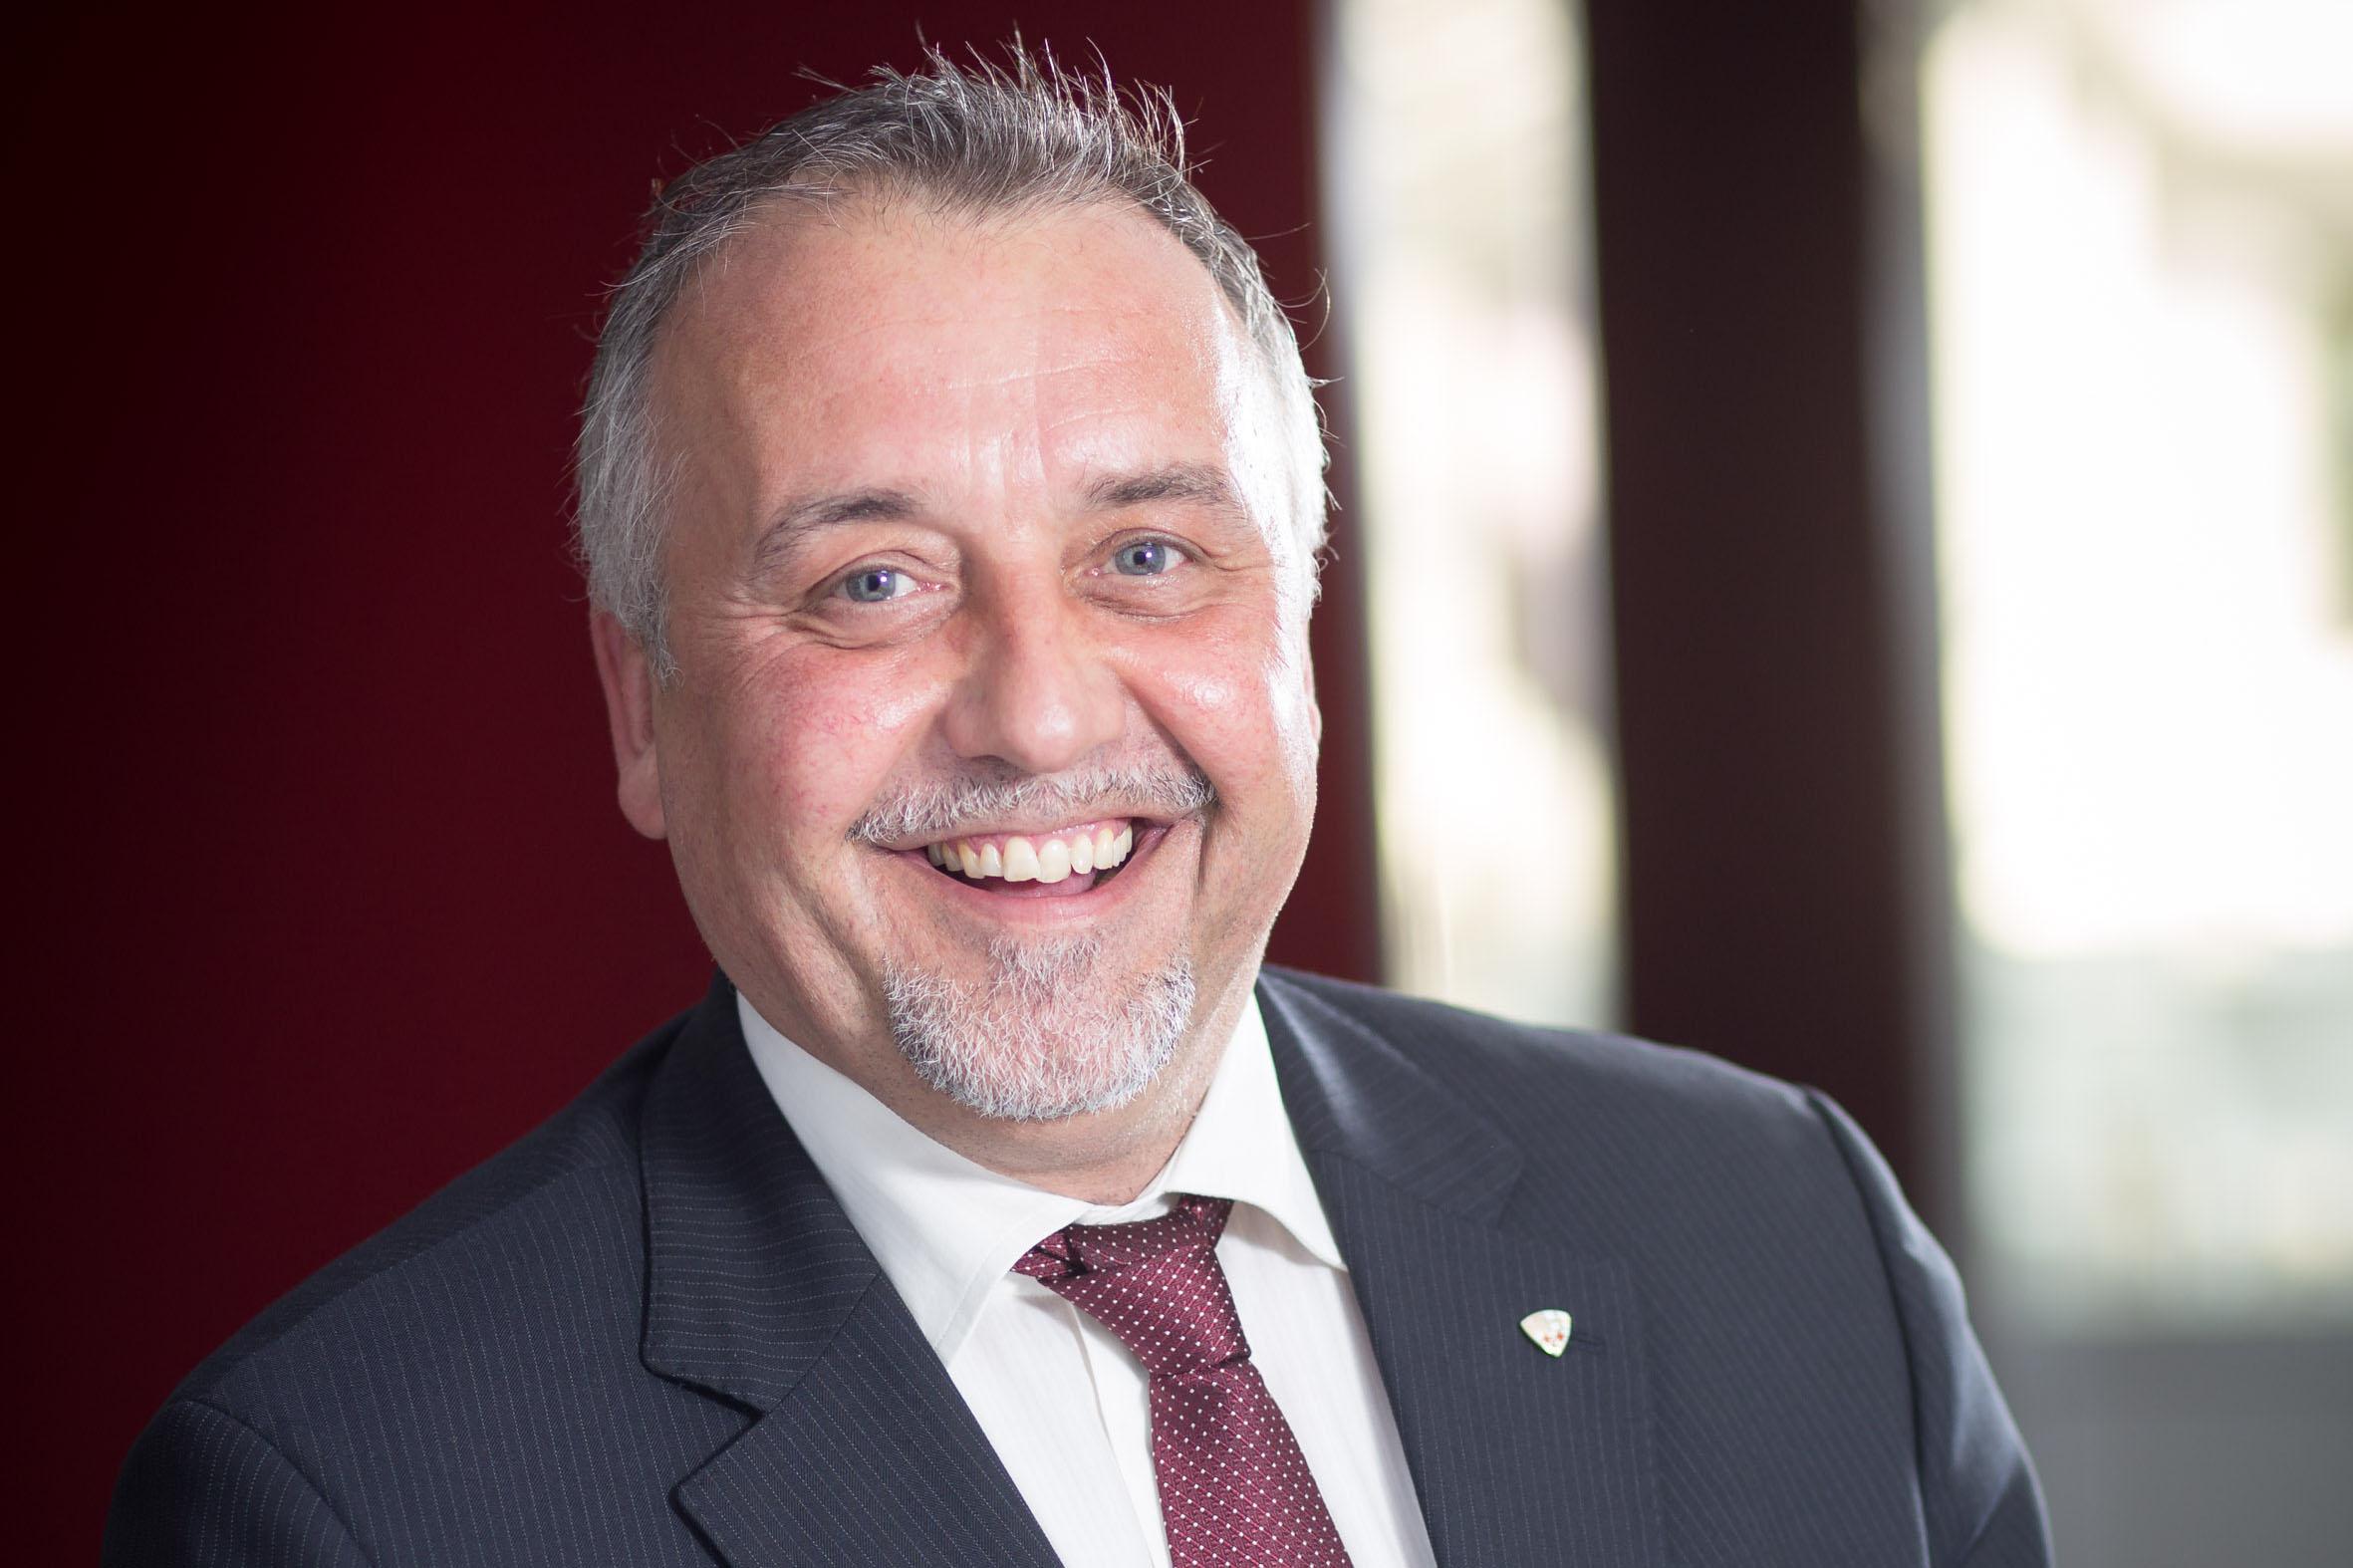 Fachgruppenobmann der Tiroler Versicherungsmakler Thomas Tiefenbrunner